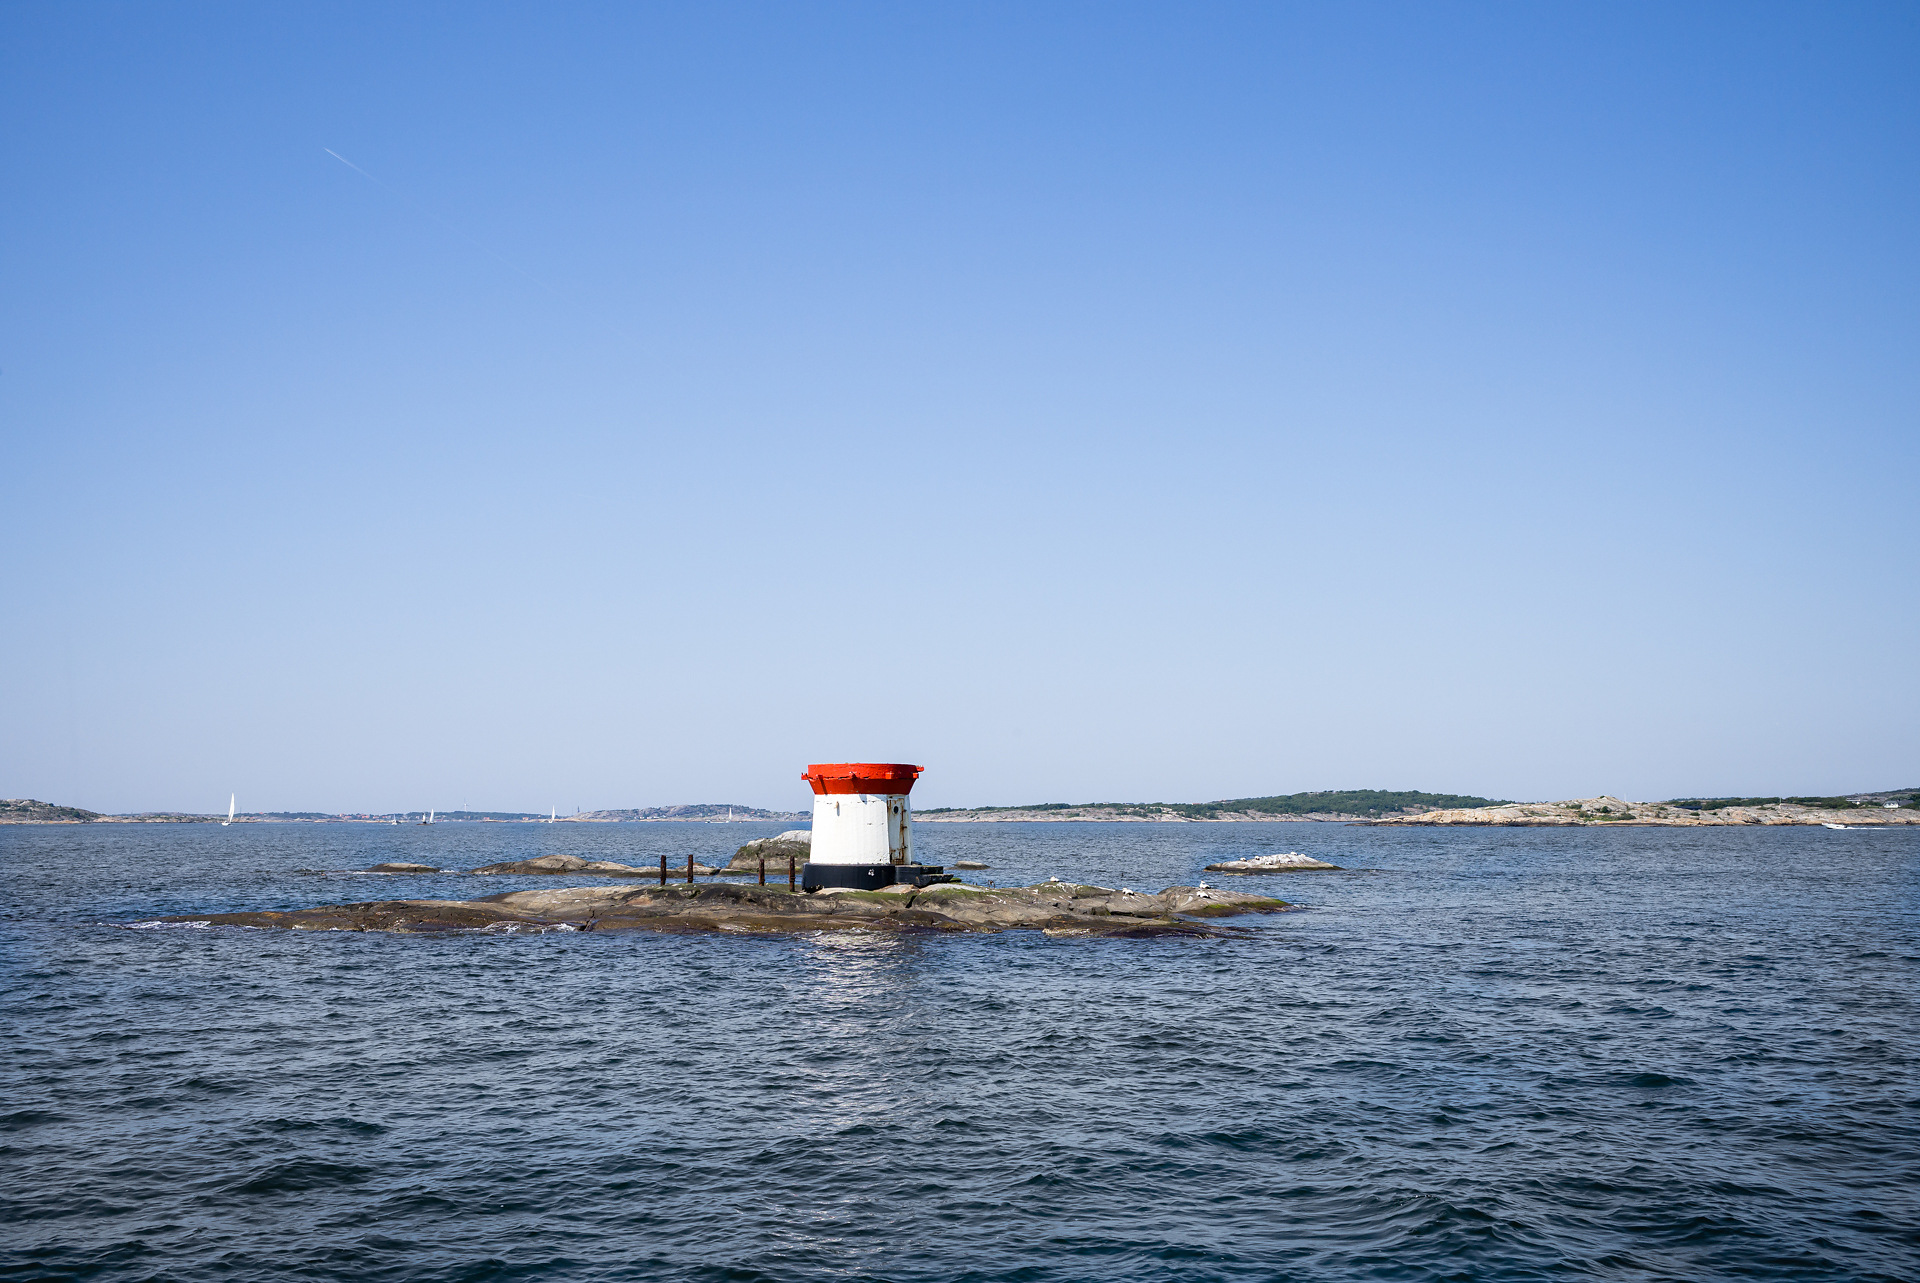 Göteborgs hamn, farledsmärke